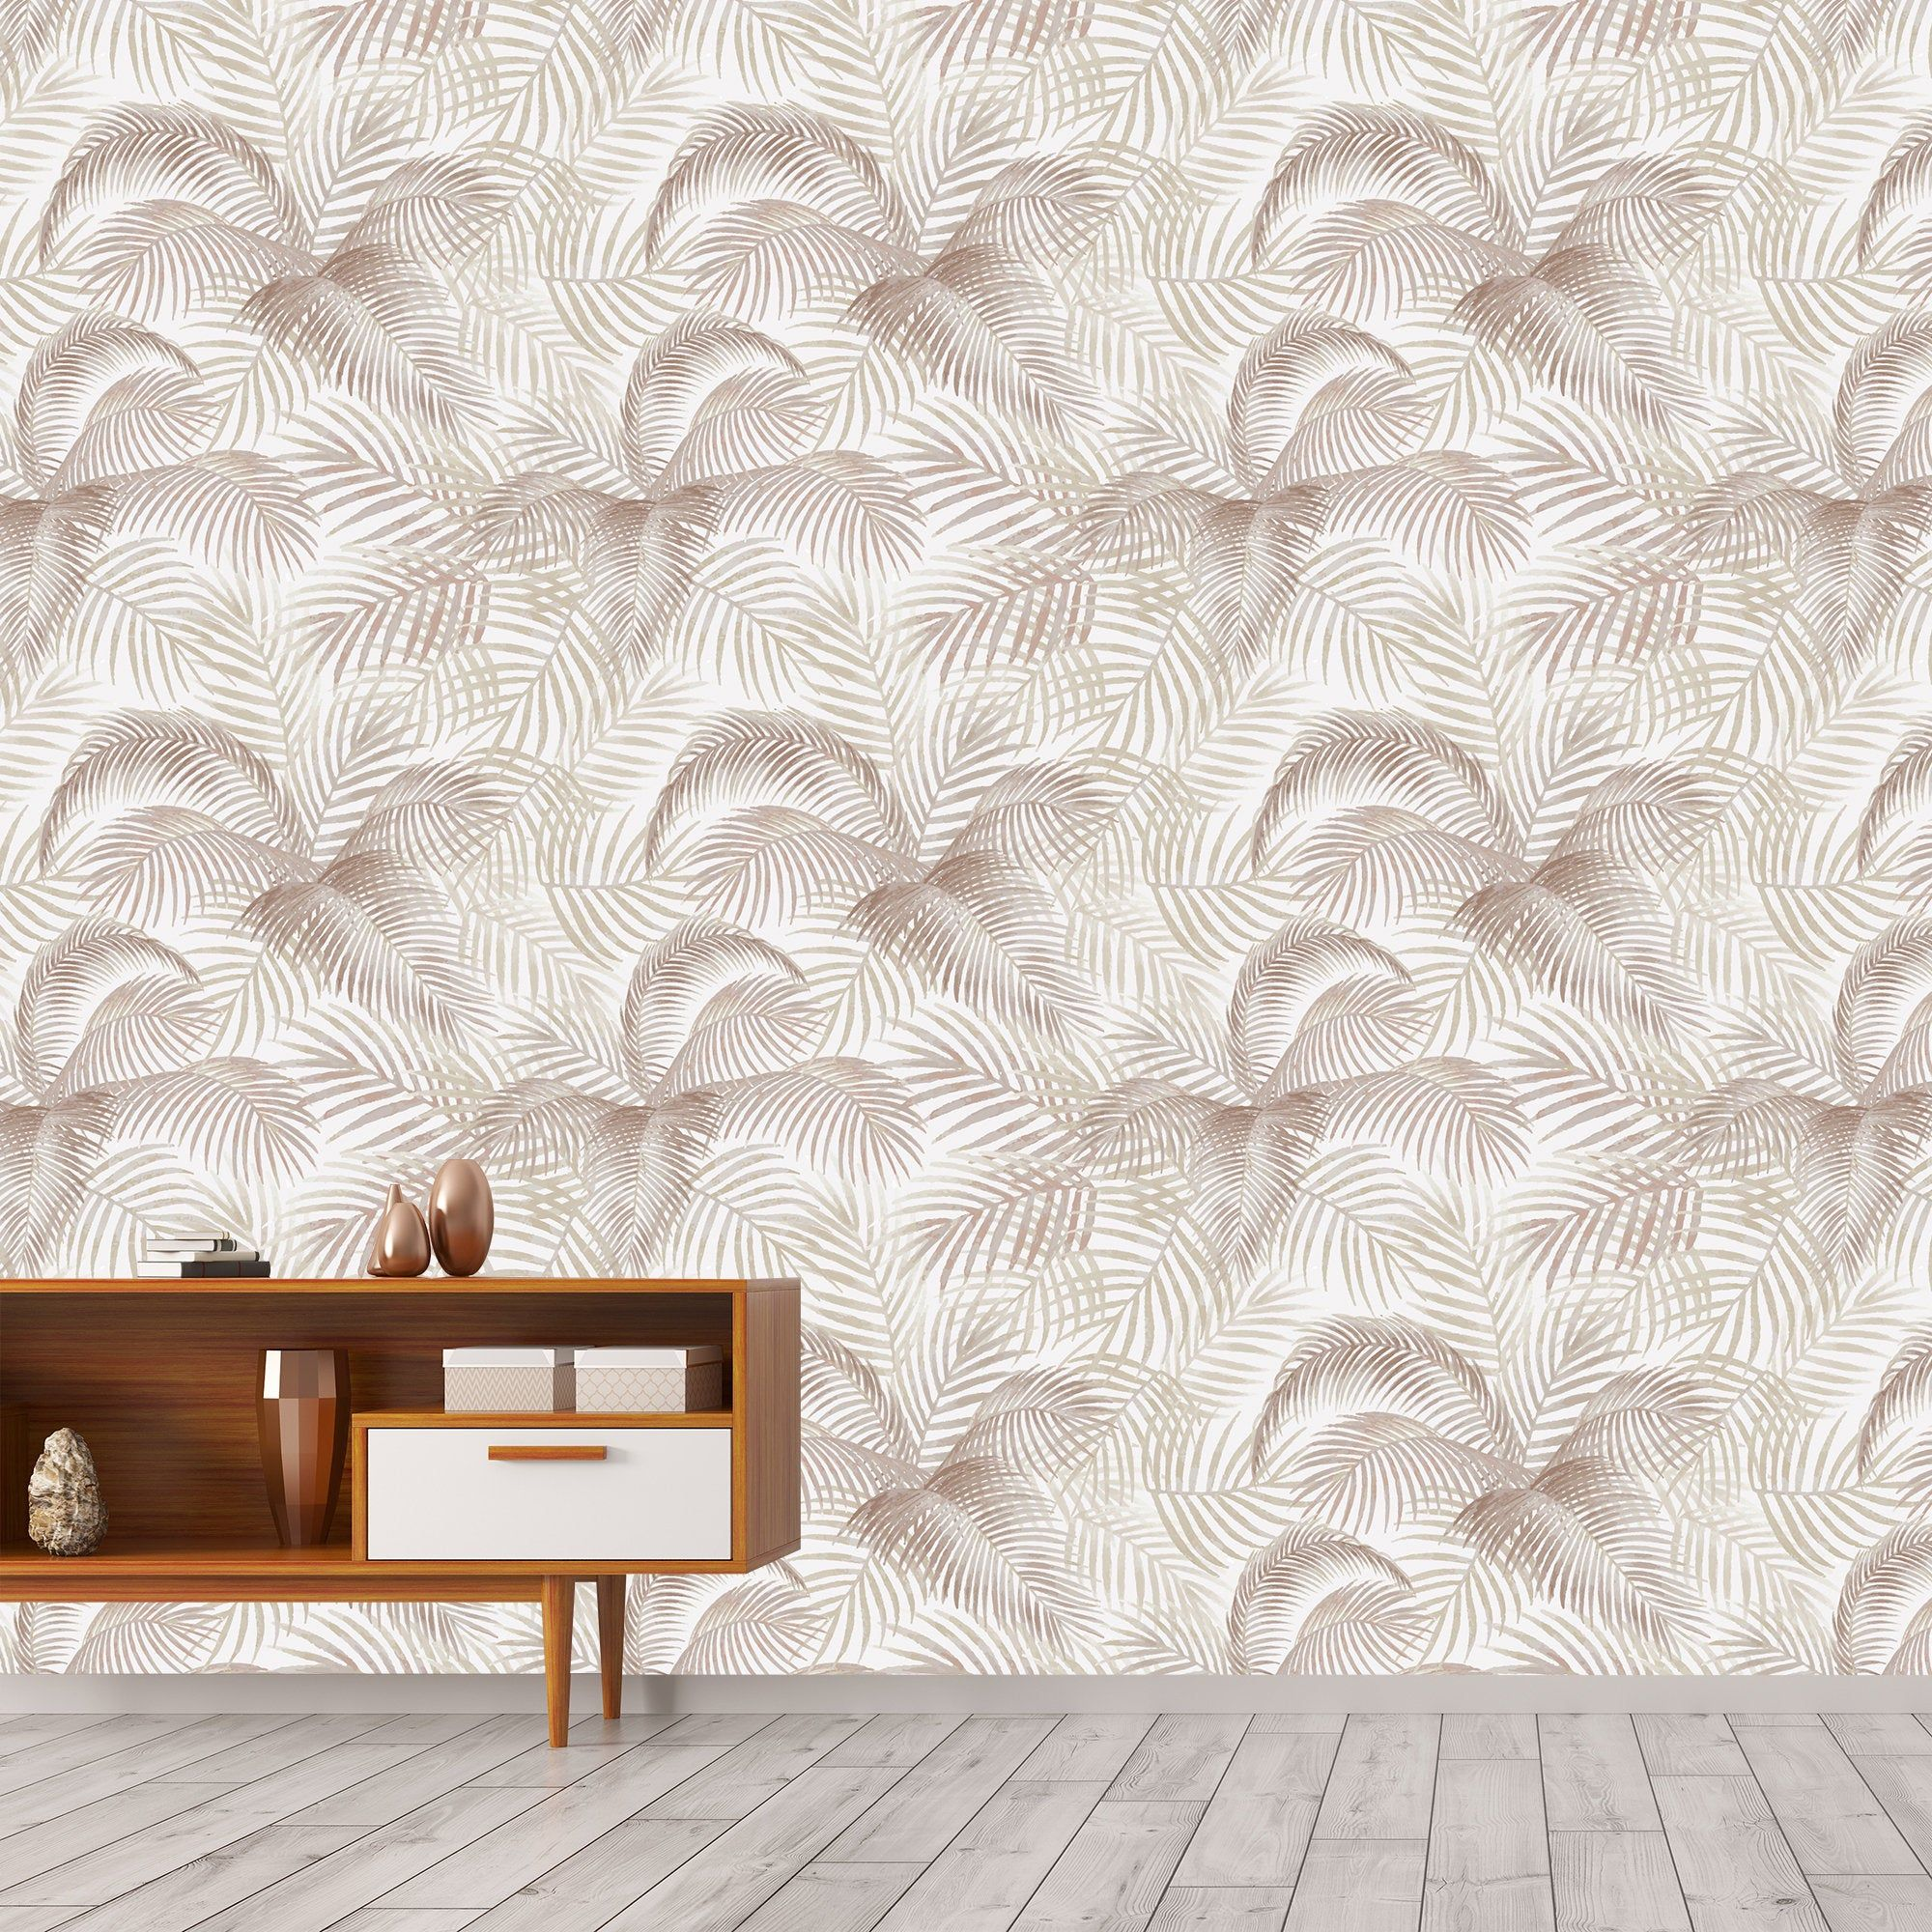 Palm Leaf Wallpaper Removable Wallpaper Brown Leaf Wall Etsy Removable Wallpaper Leaf Wallpaper Palm Leaf Wallpaper